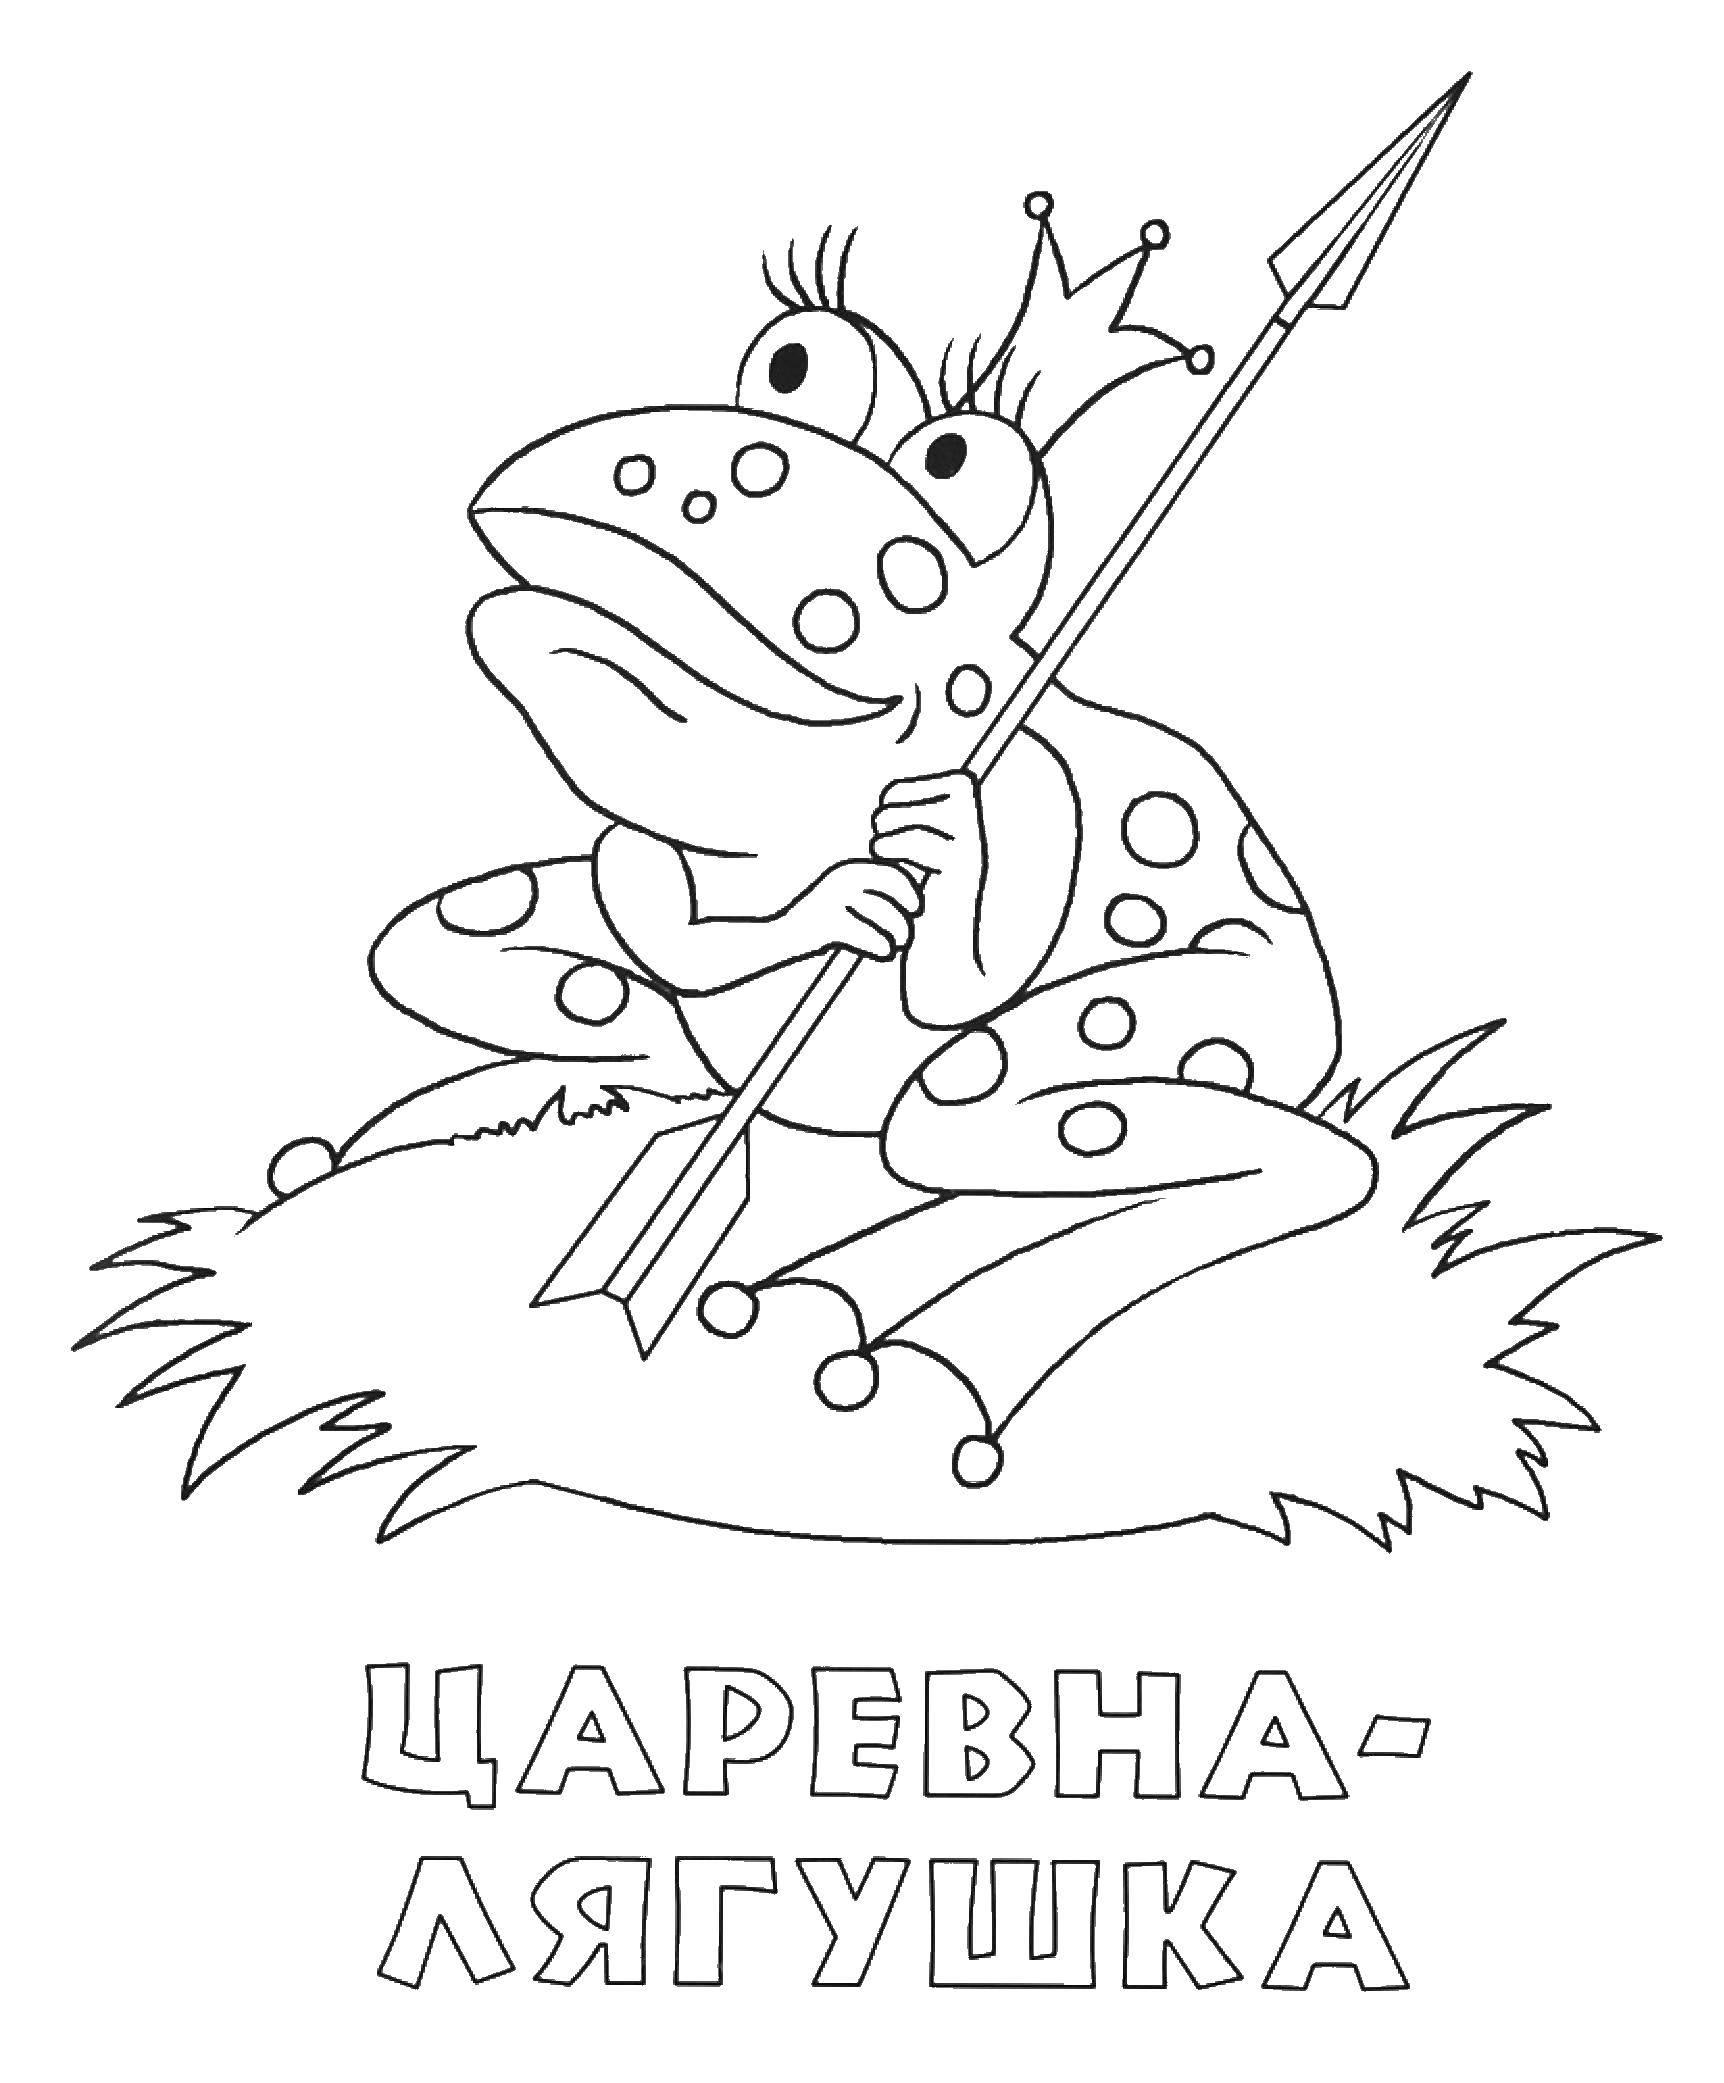 Сказка царевна лягушка в картинках карандашом